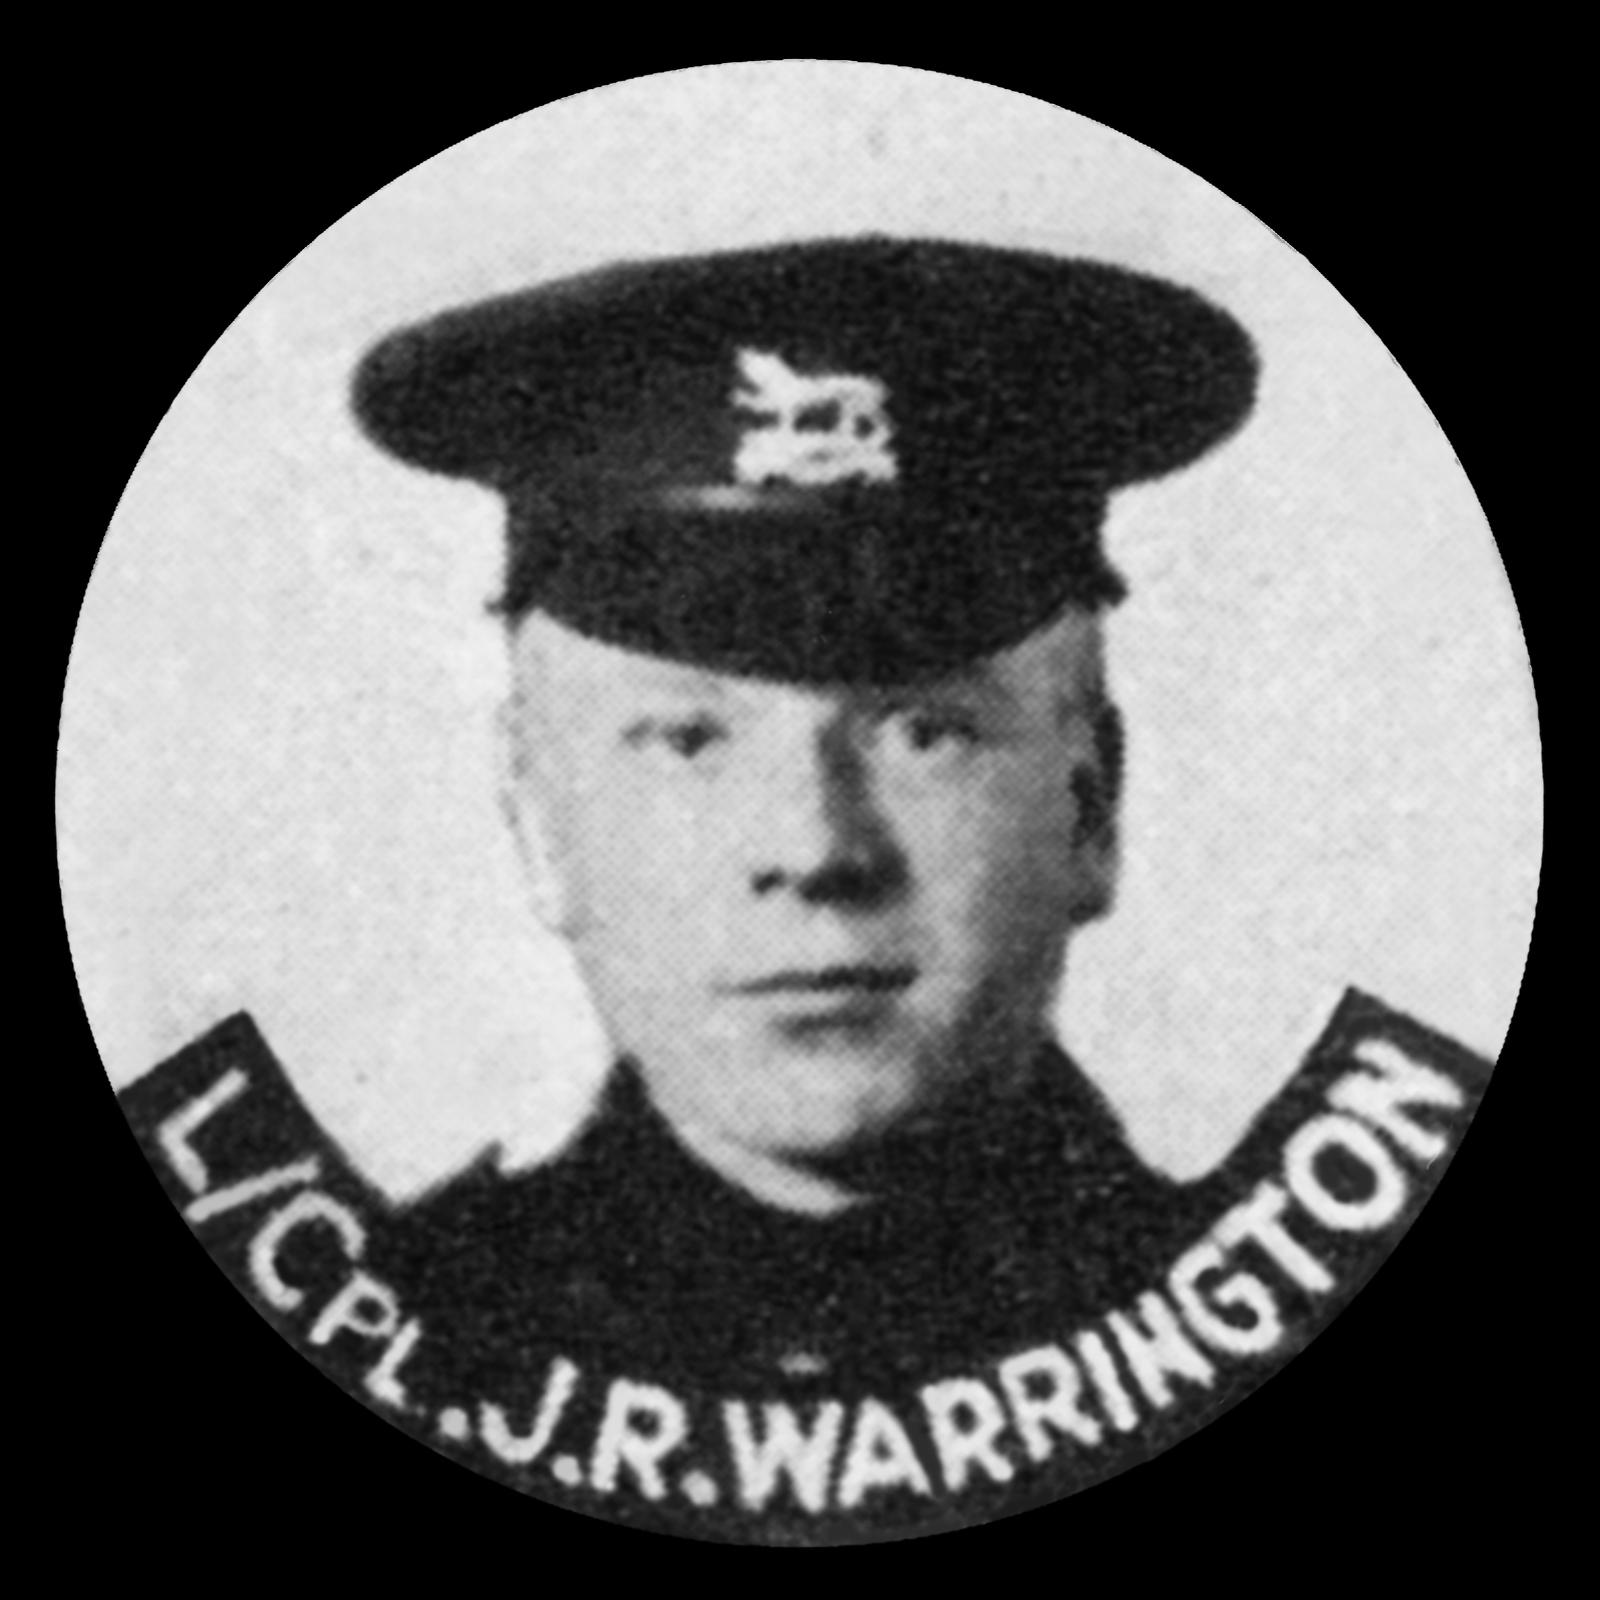 WARRINGTON John Robert